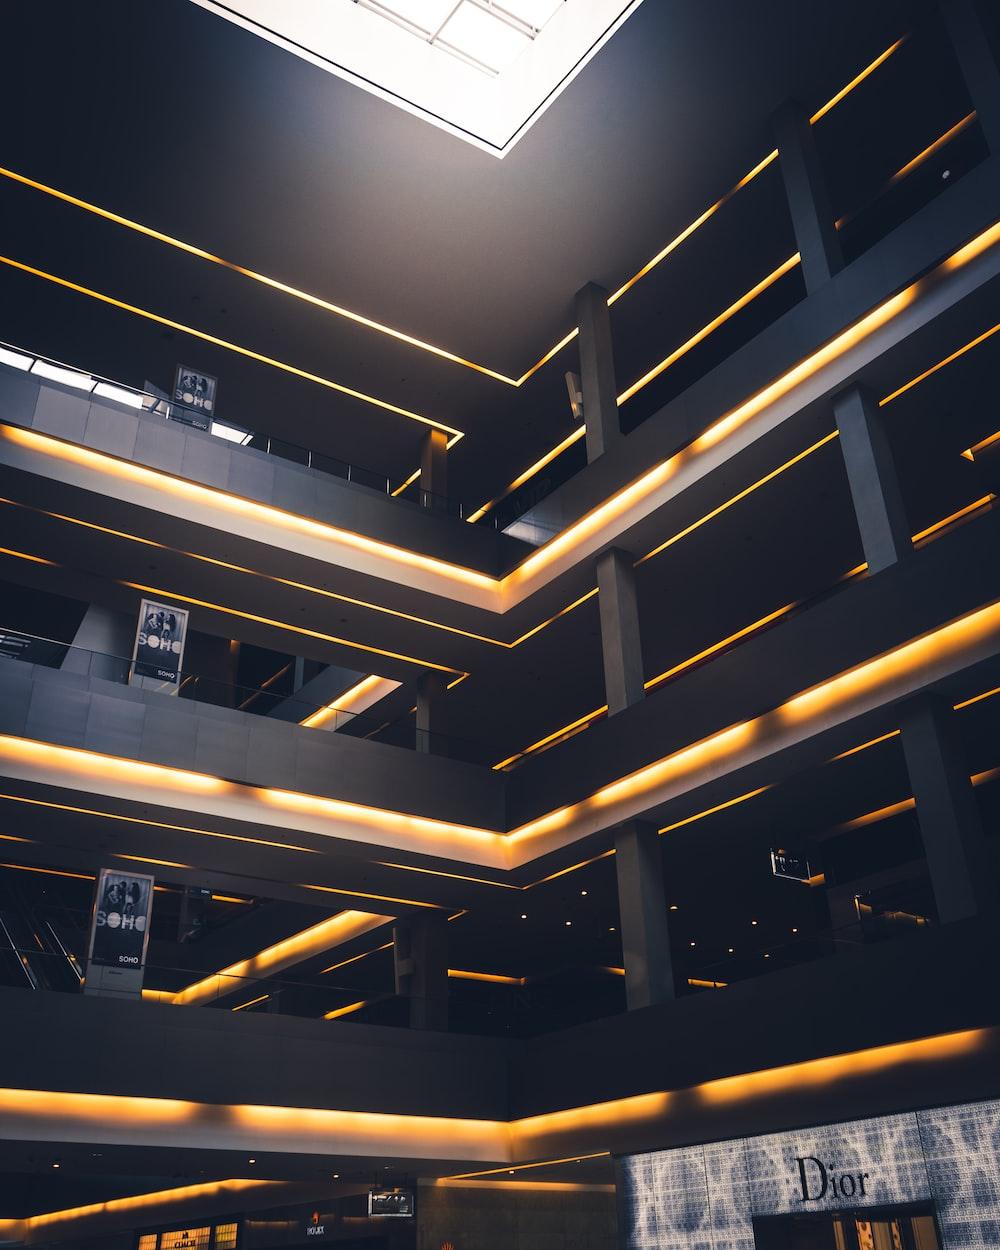 escalators inside building